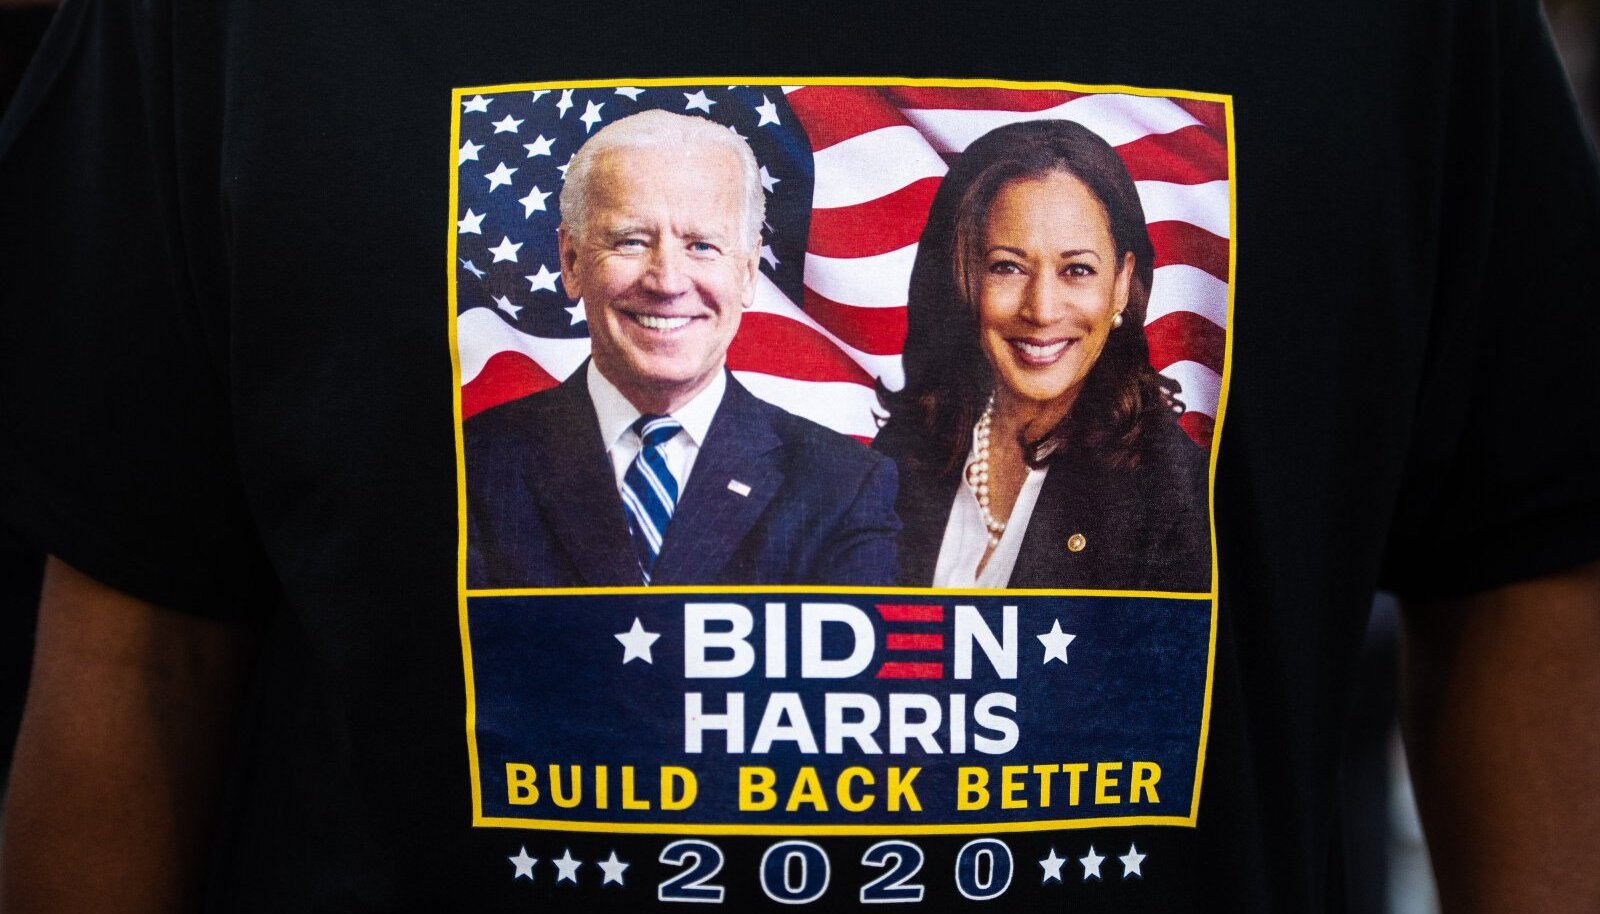 Post Election Atmosphere - Washington D.C.